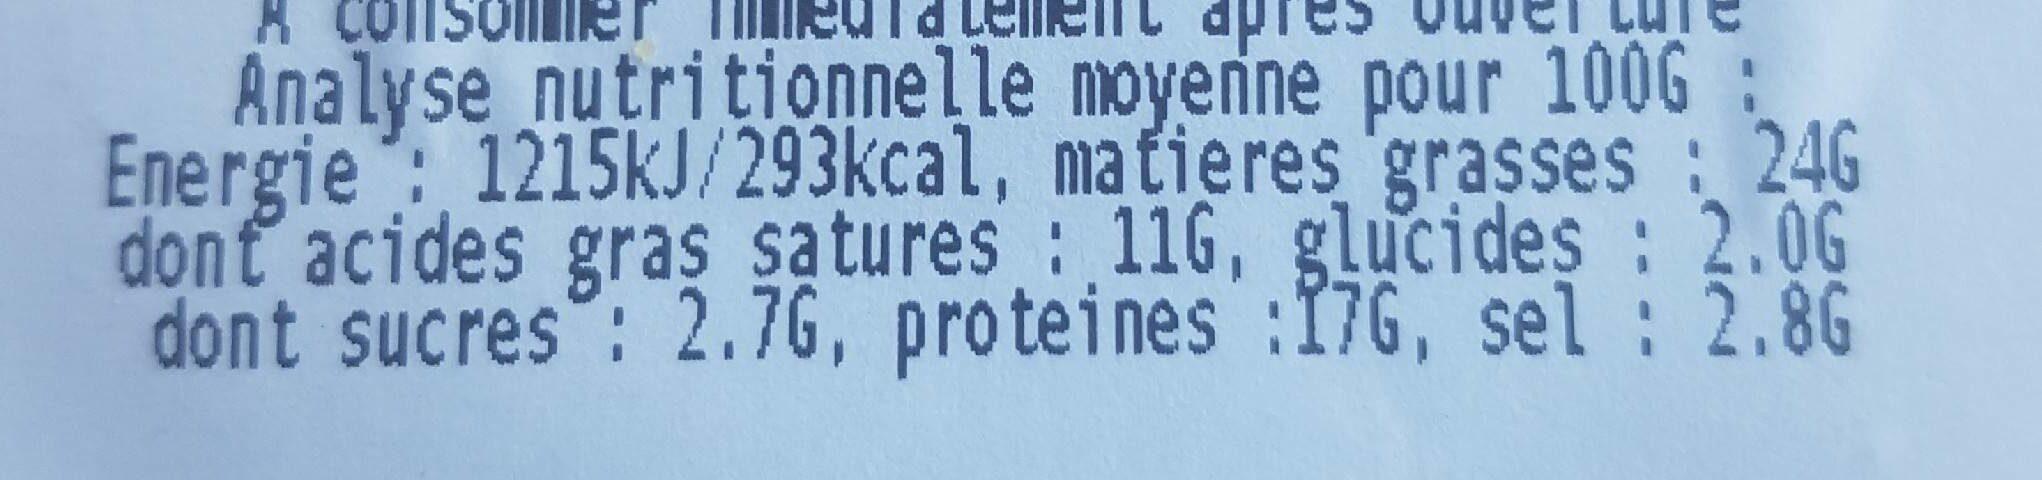 Saucisson de Dinde, Halal - Nährwertangaben - fr